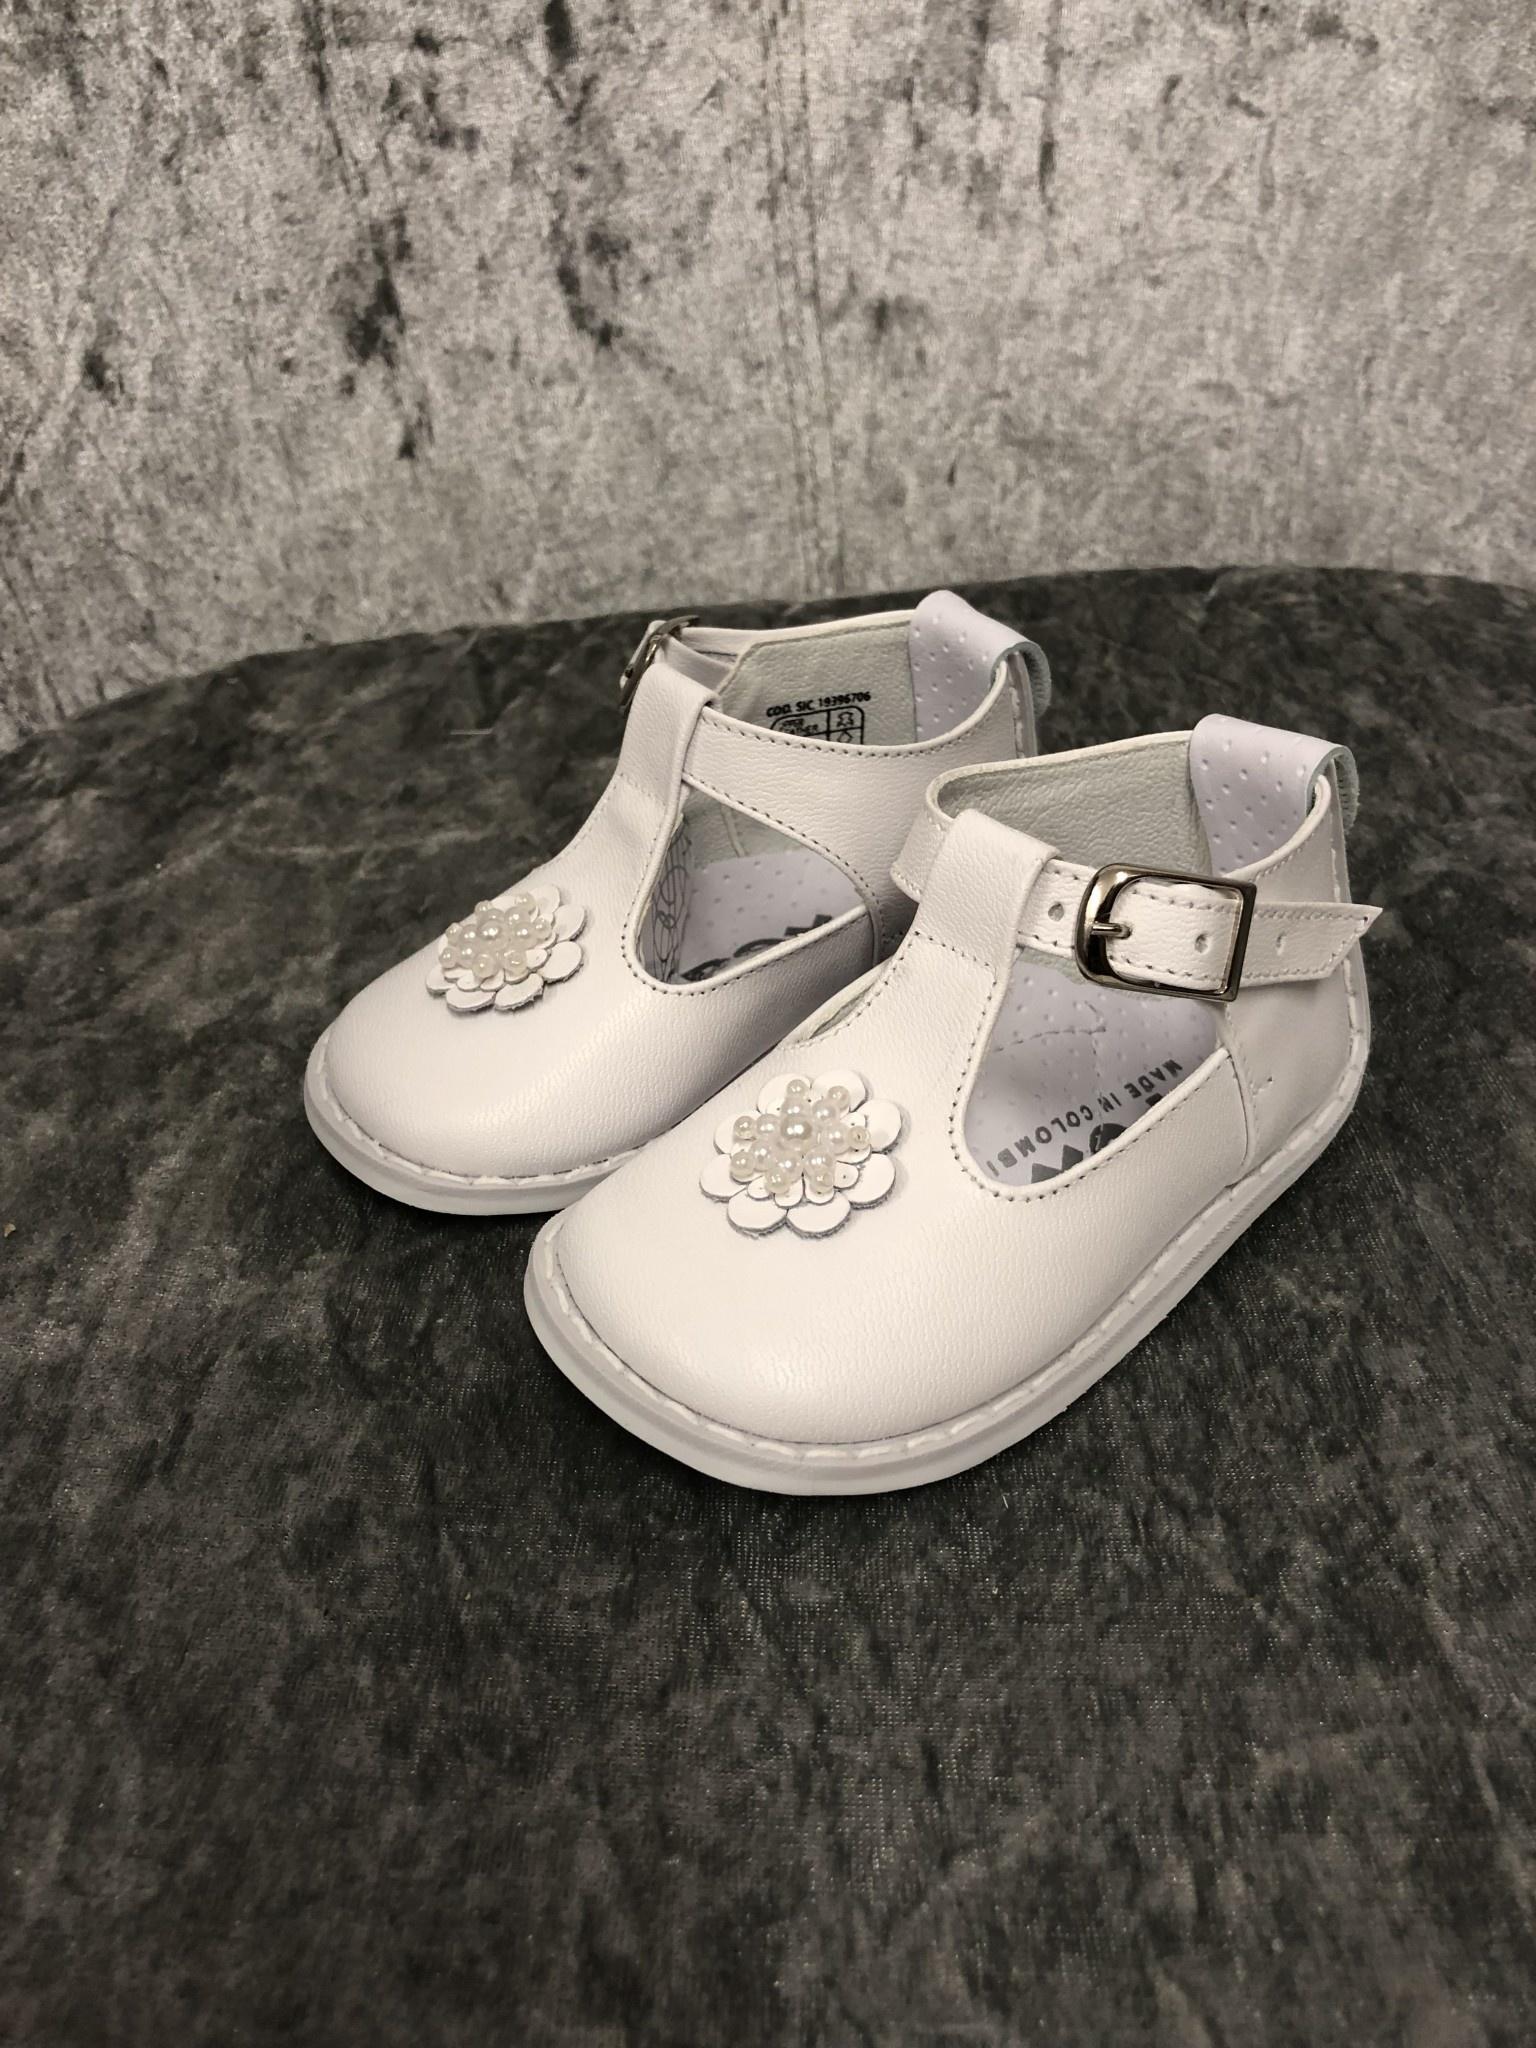 Pex Pex Eddie Girls Shoes With Bead Flower